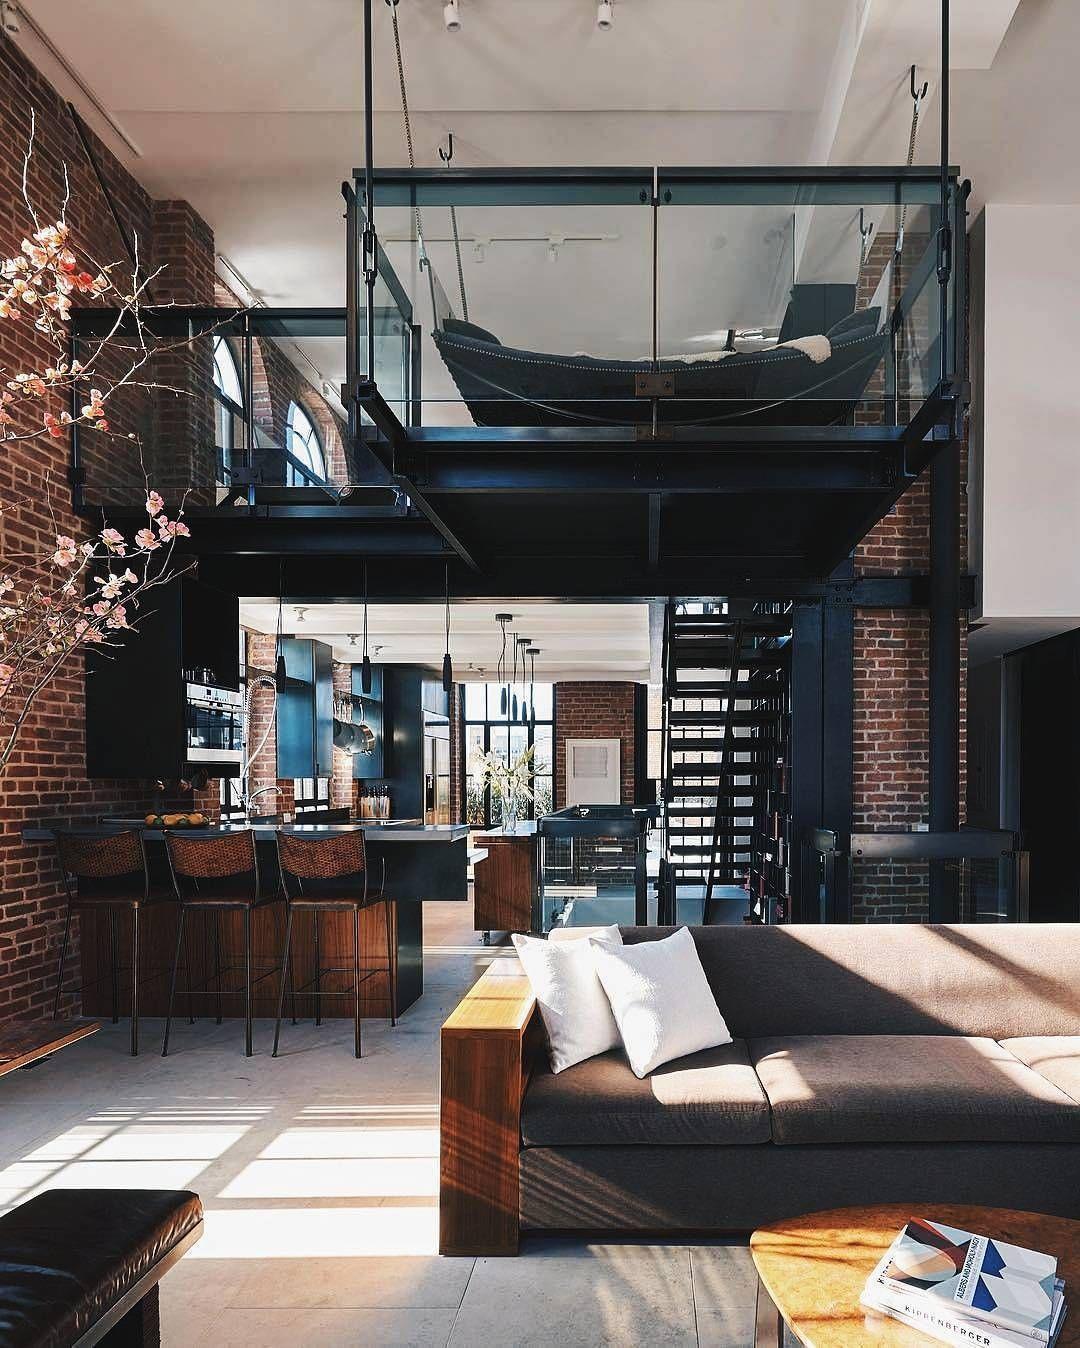 Top 19 coolest male living space design ideas for inspiration mancavedesign livingroomdecor mensroom